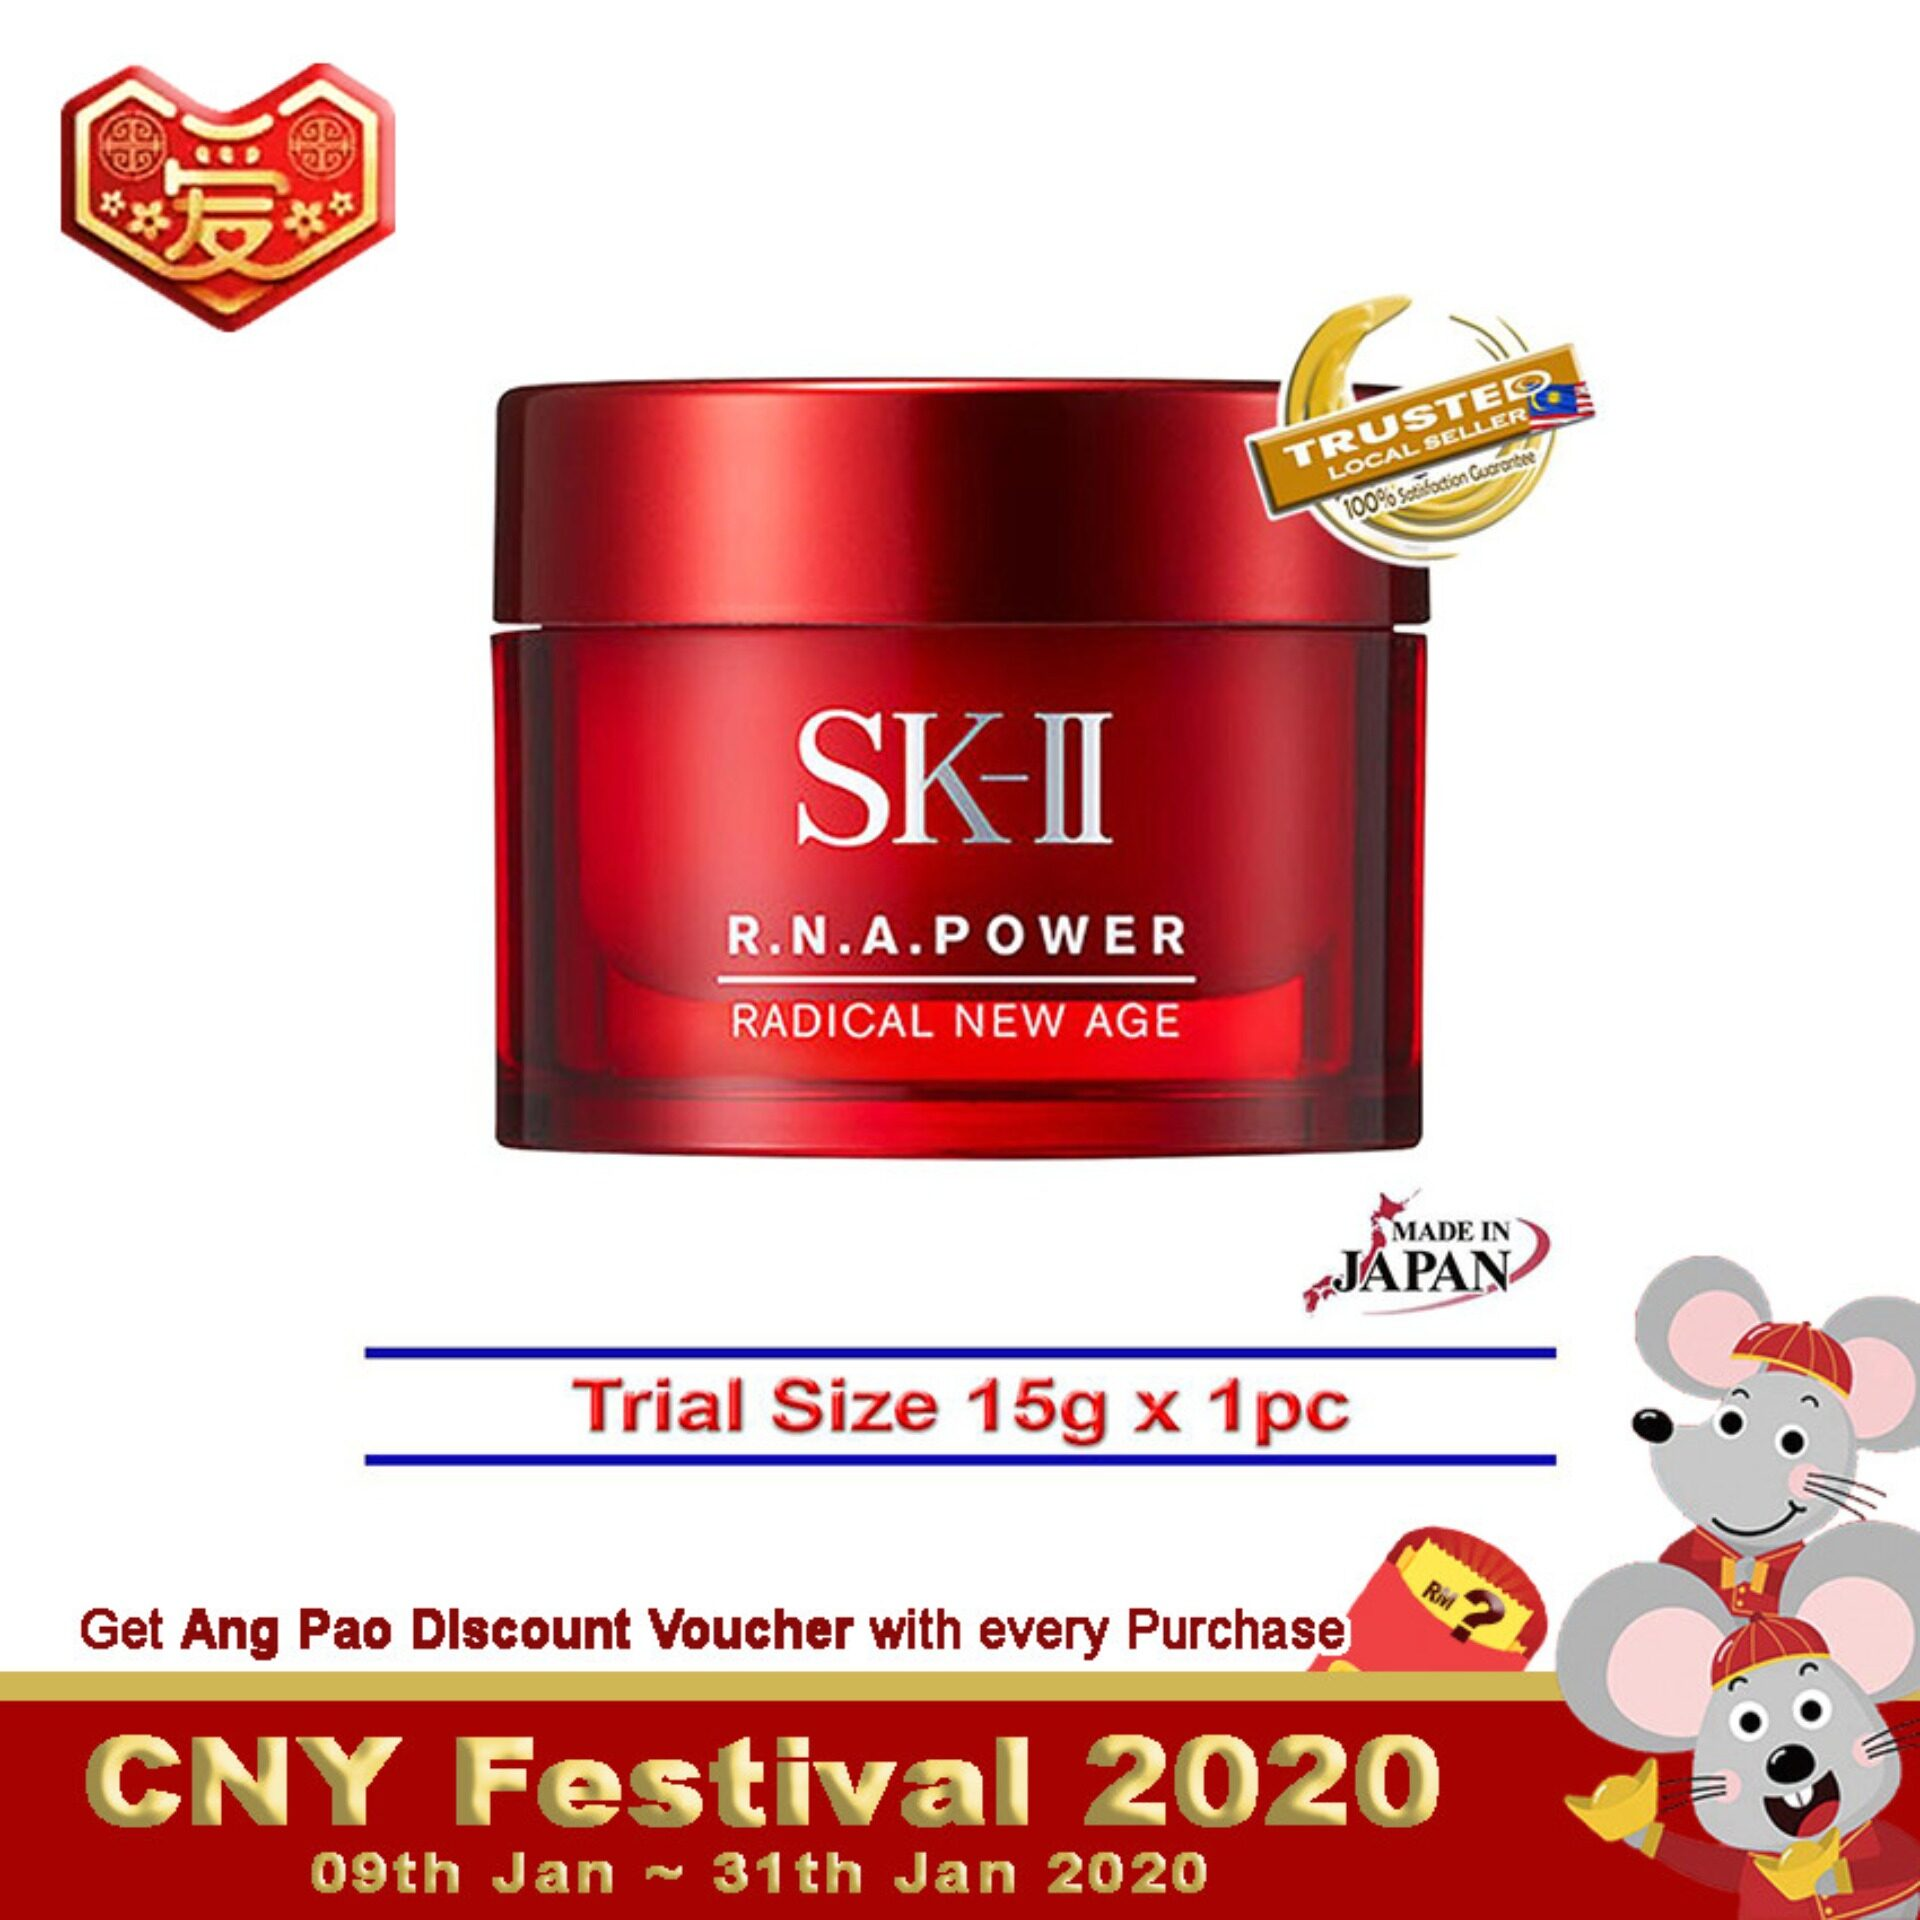 SK-II R.N.A. Power Radical New Age 15g